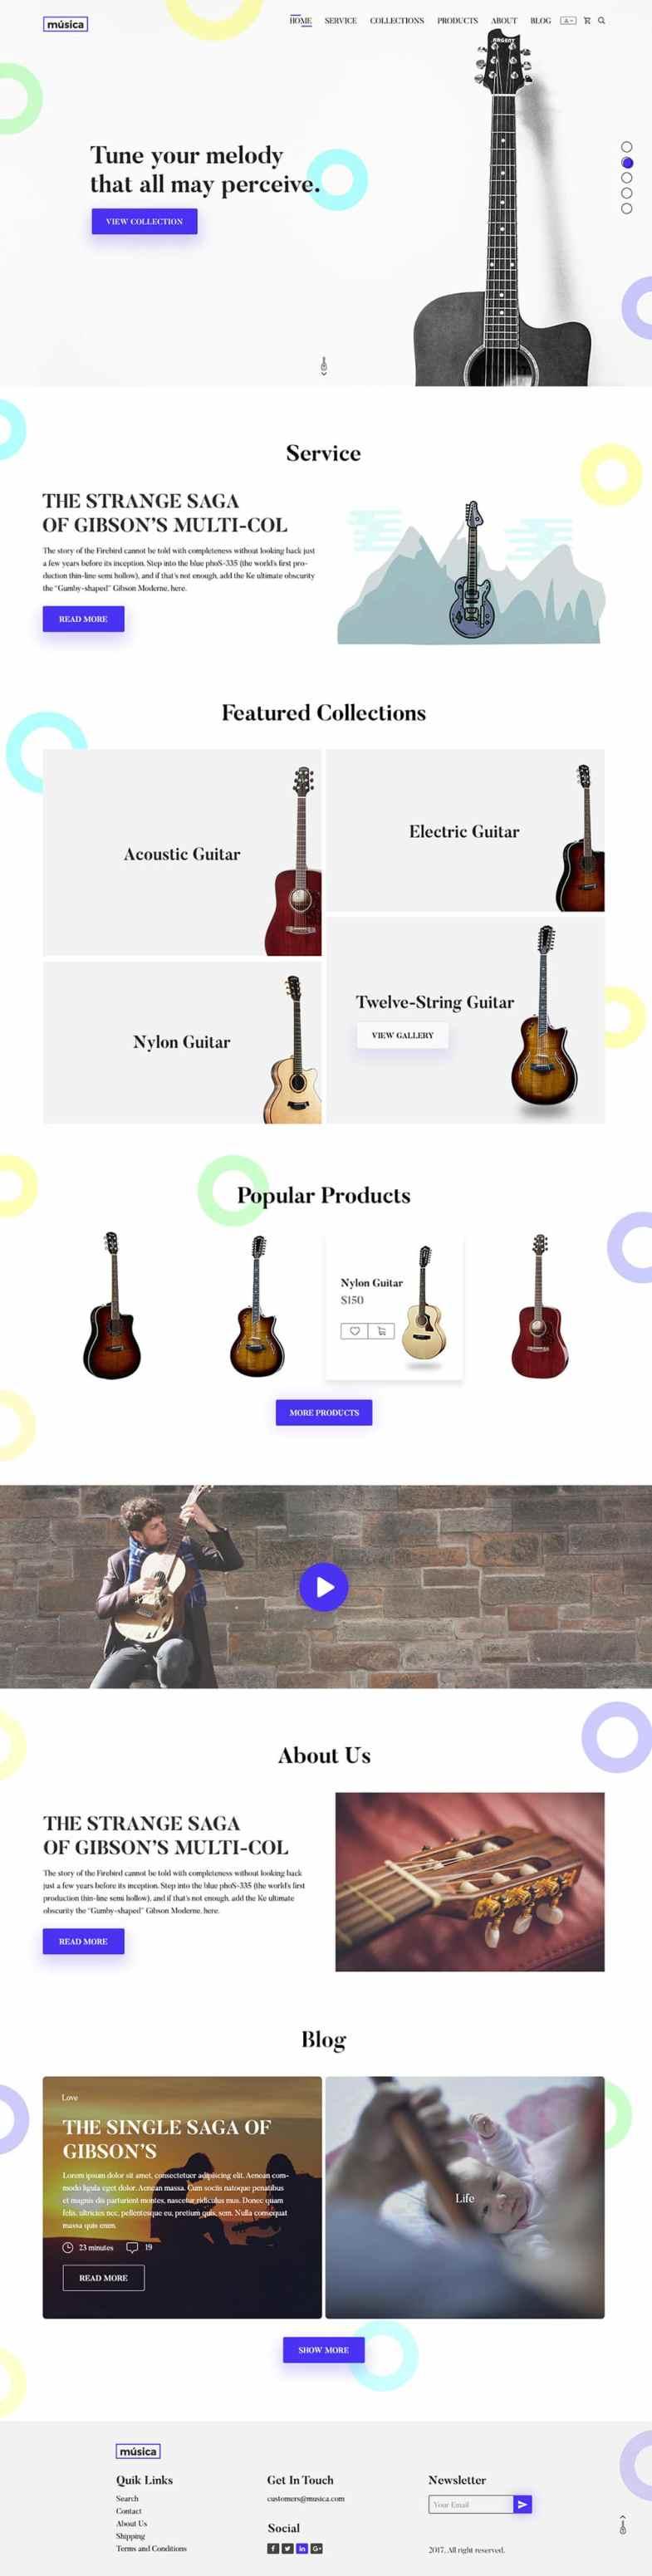 Guitar Store E commerce Web Template PSD Бесплатные шаблоны для интернет-магазина psd - Guitar Store E commerce Web Template PSD - Бесплатные шаблоны для интернет-магазина PSD